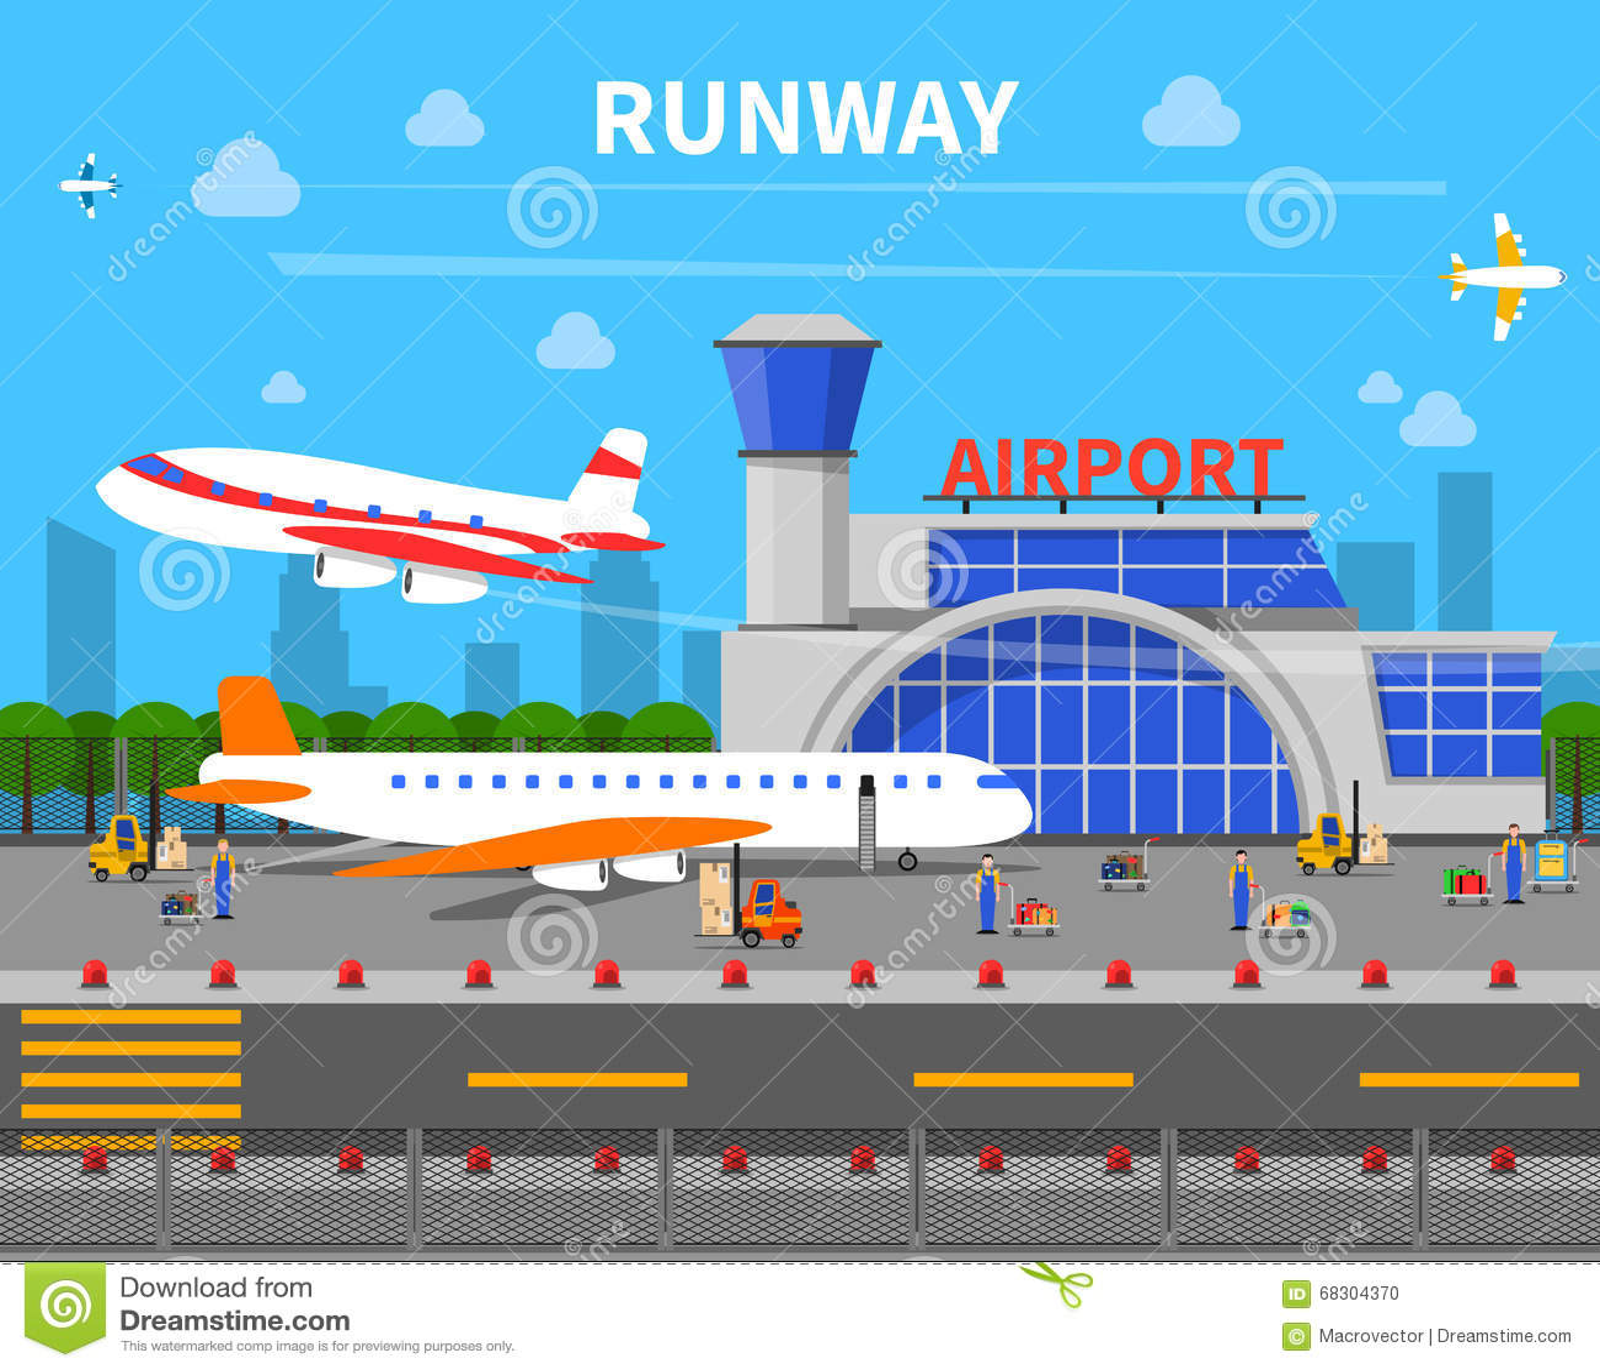 Airport Runway Illustration Stock Vector Image 68304370